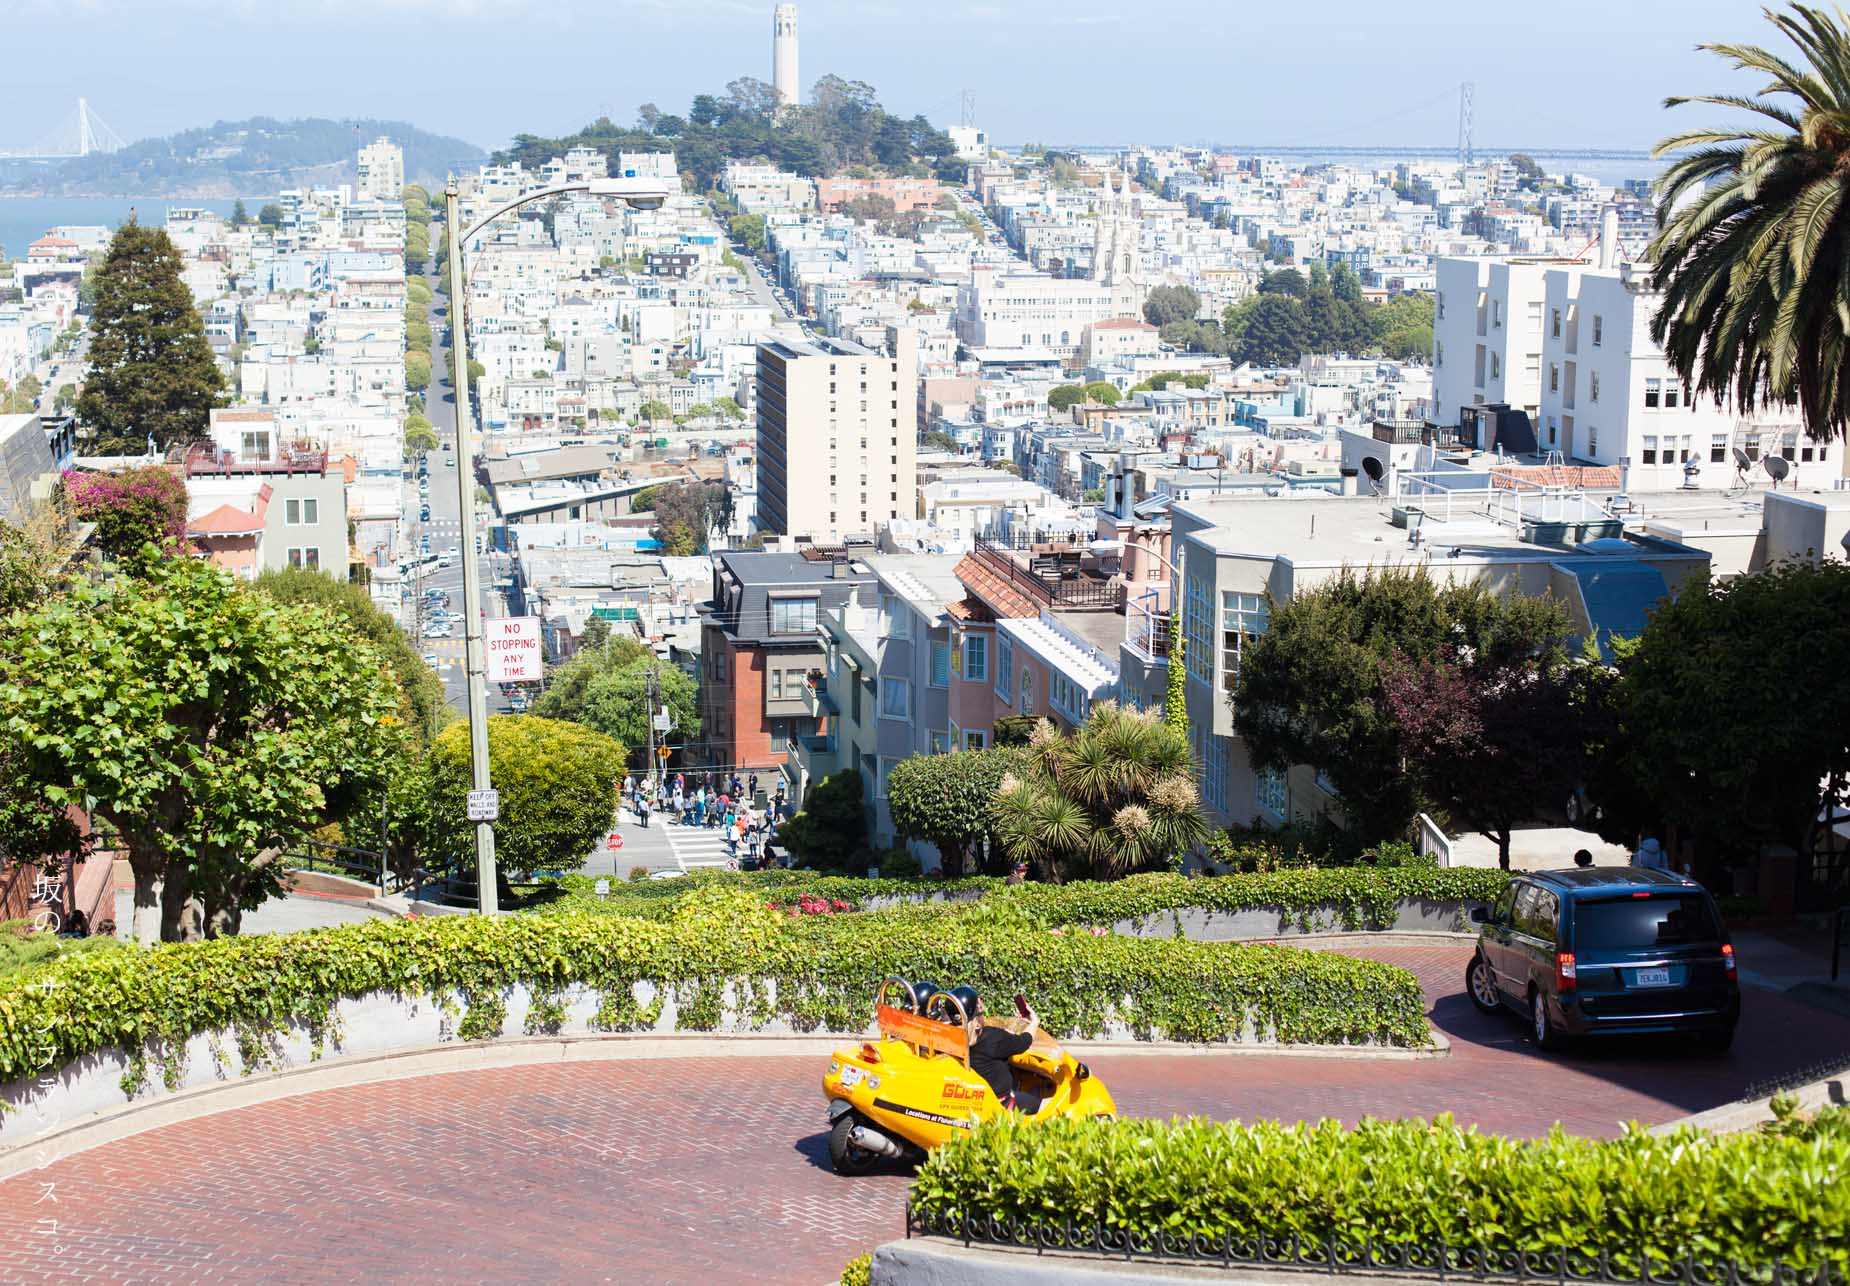 201500611g_坂のサンフランシスコ